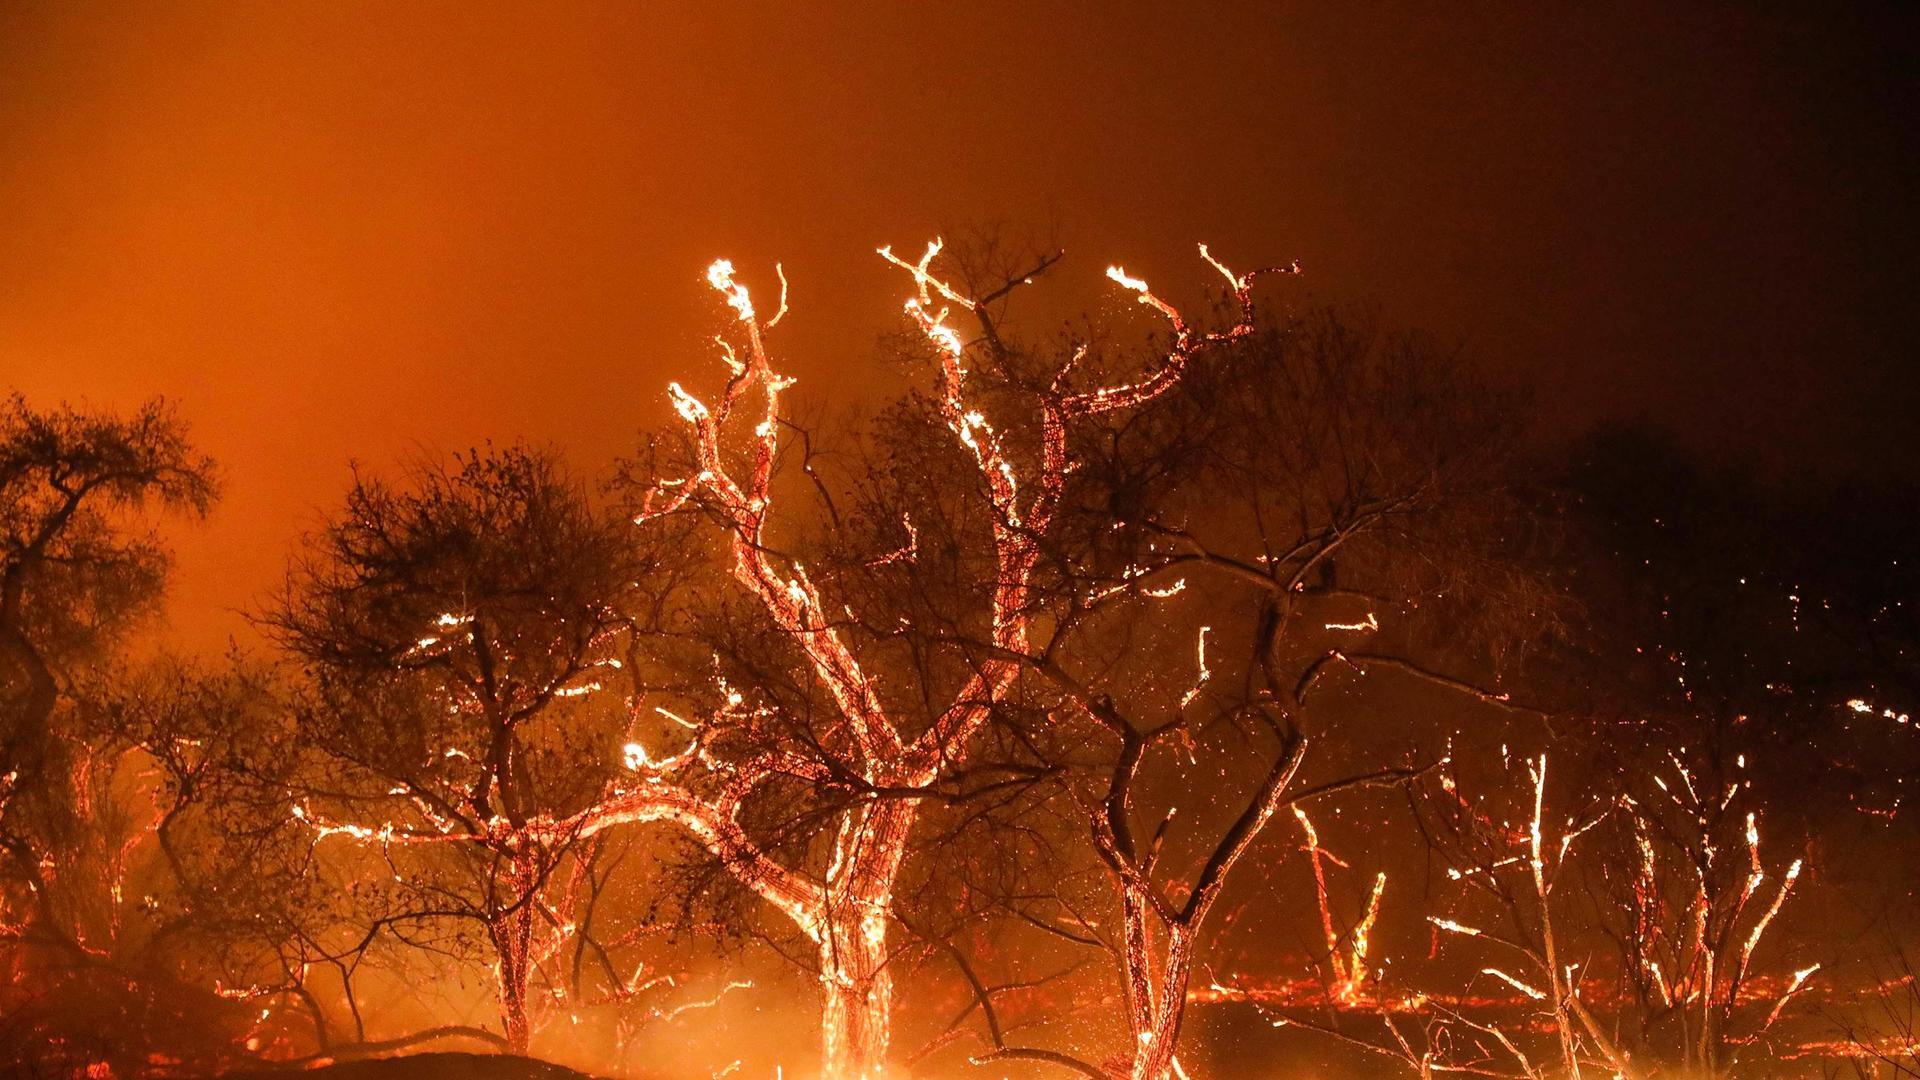 for hot, horny kostenloser Videochat 18 uninhibited down earth